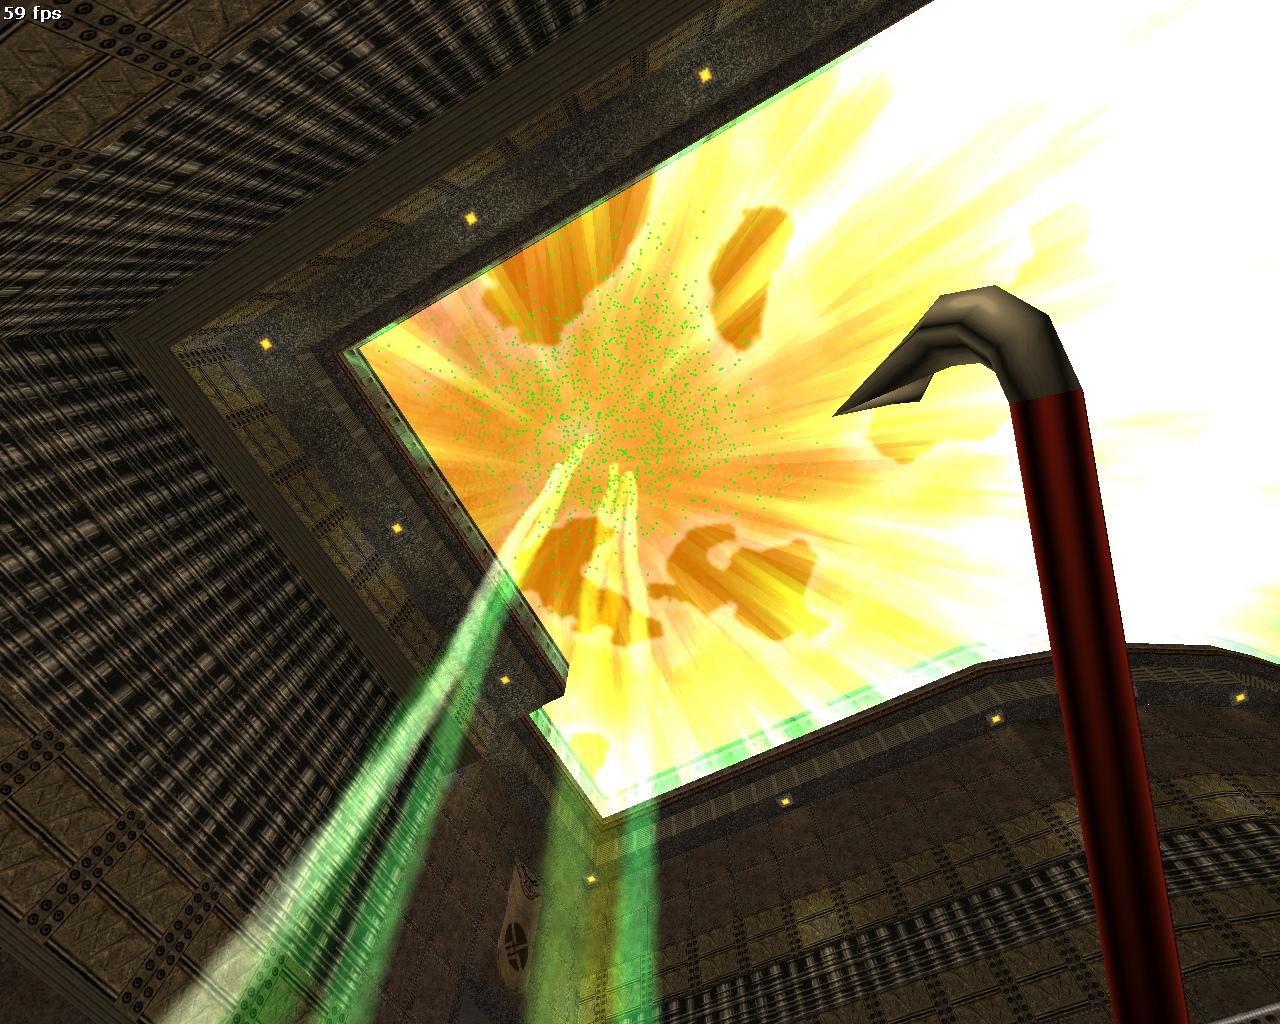 hldm_shovq2dm10001.jpg - Half-Life